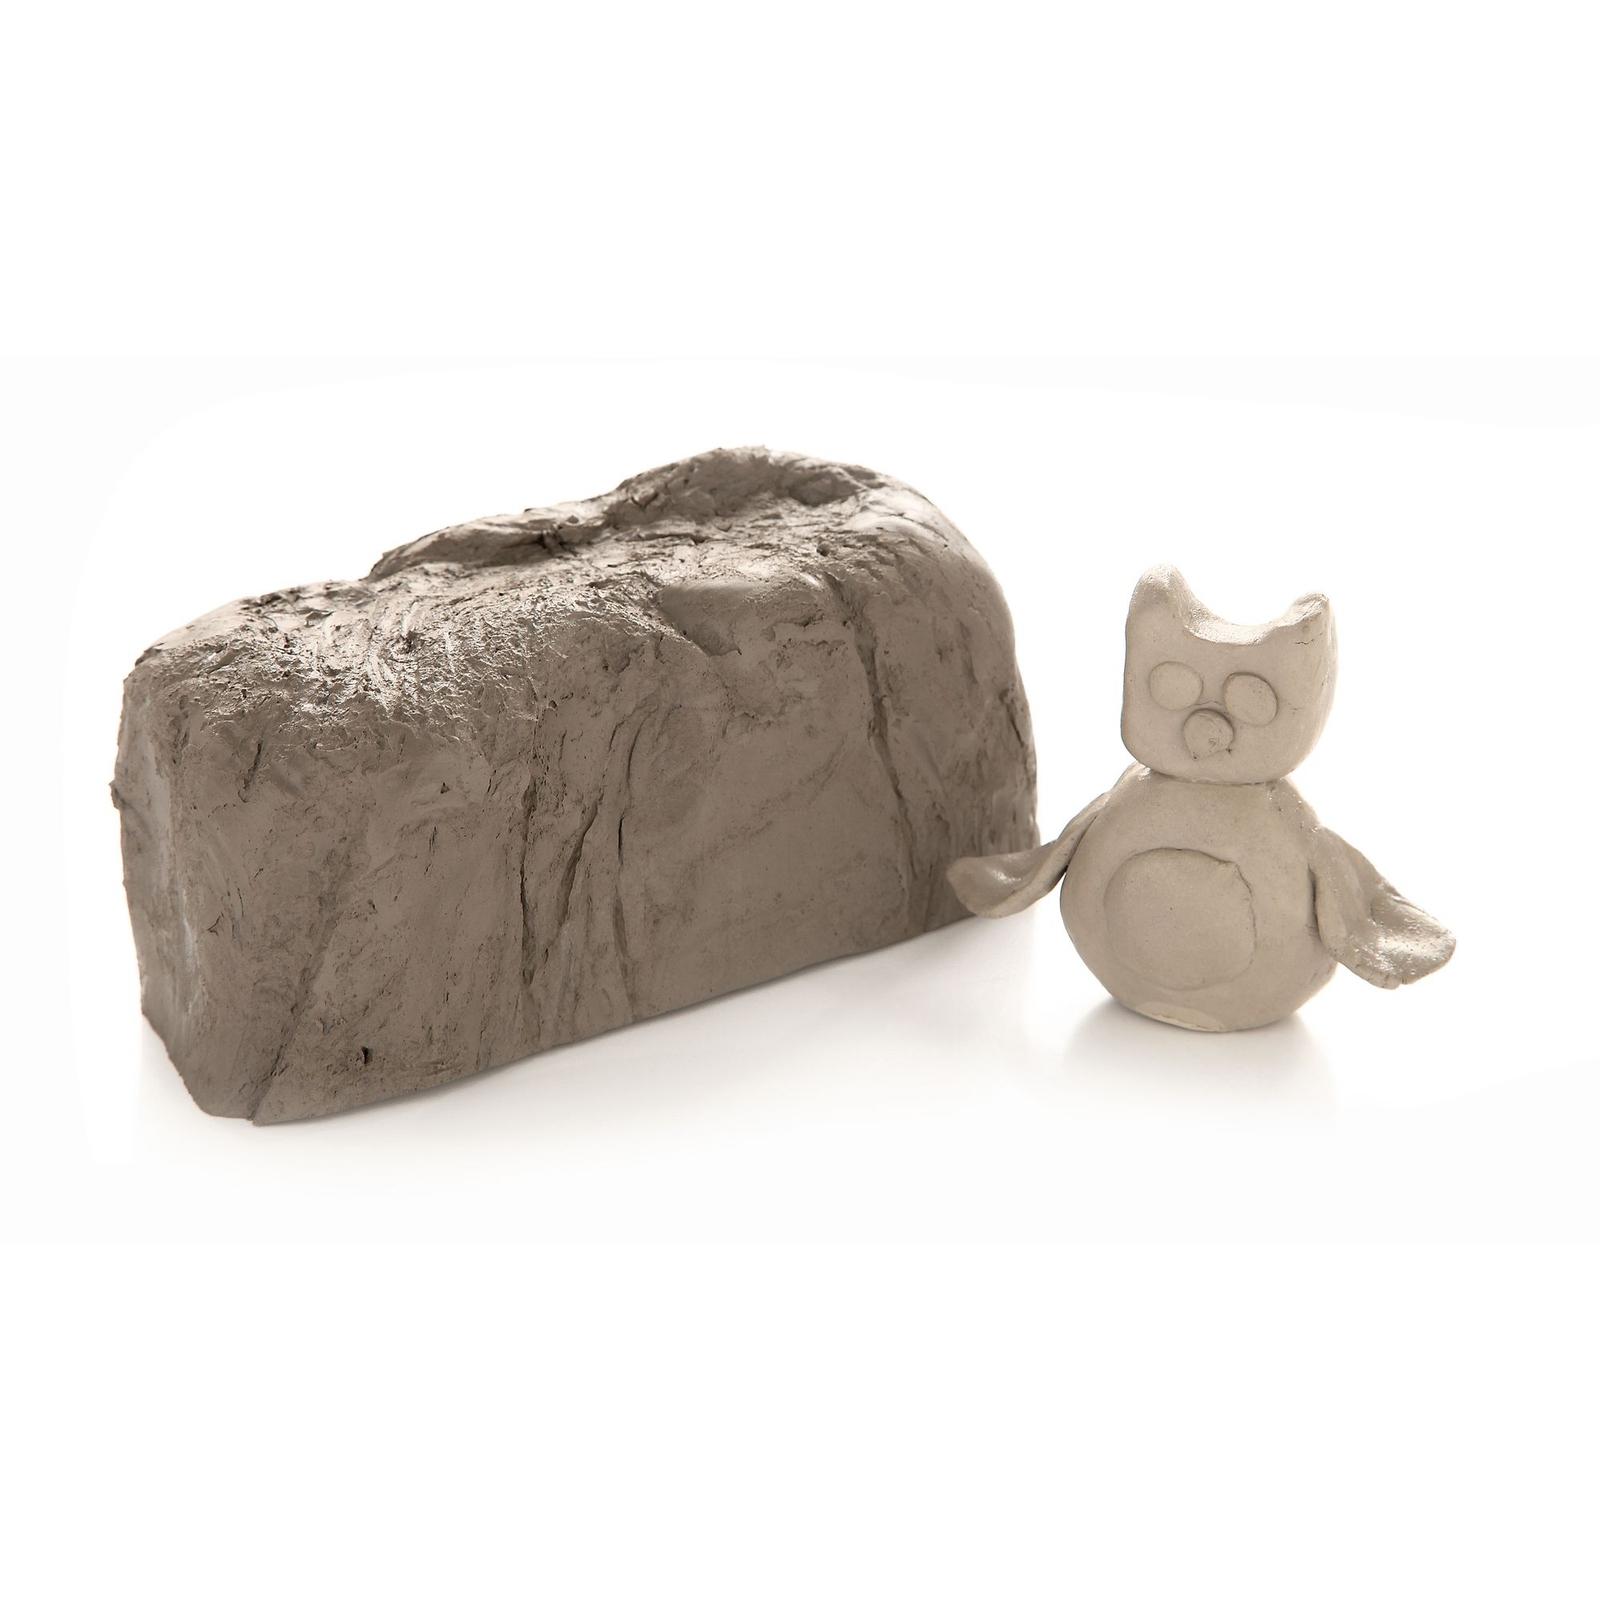 Buff School Earthenware/Stoneware Clay 10kg